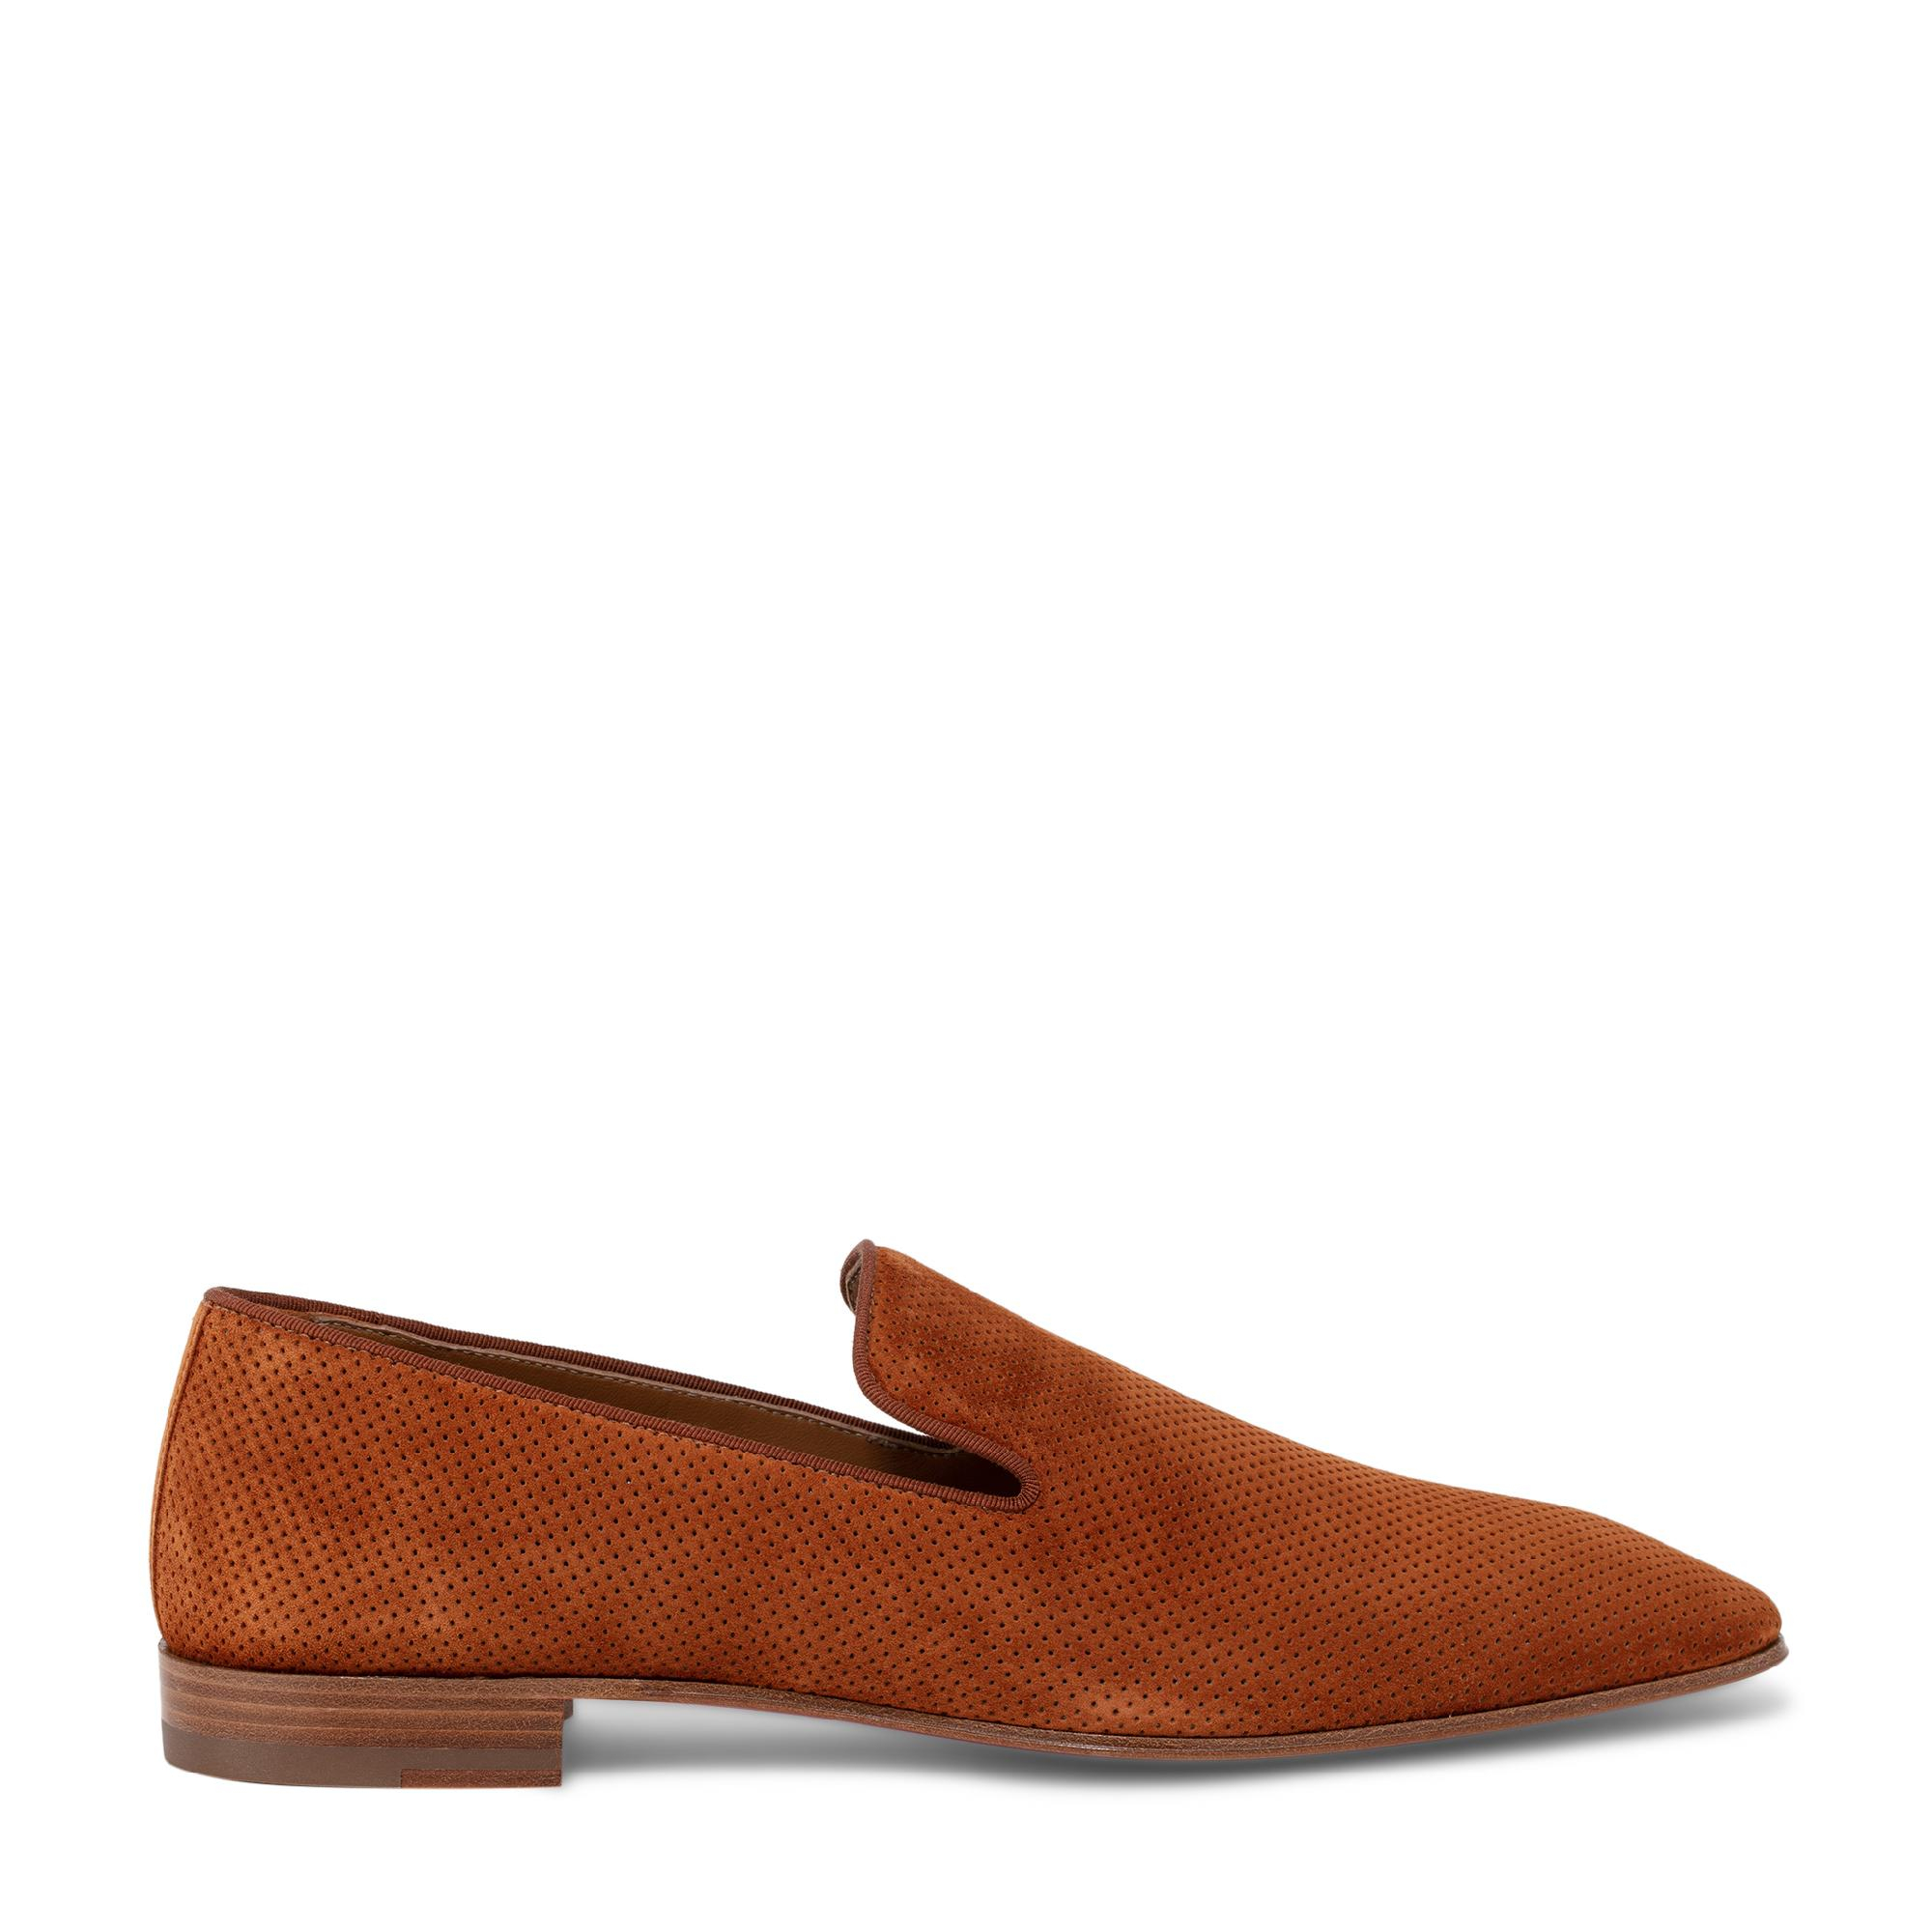 Dandelion moccasin loafers